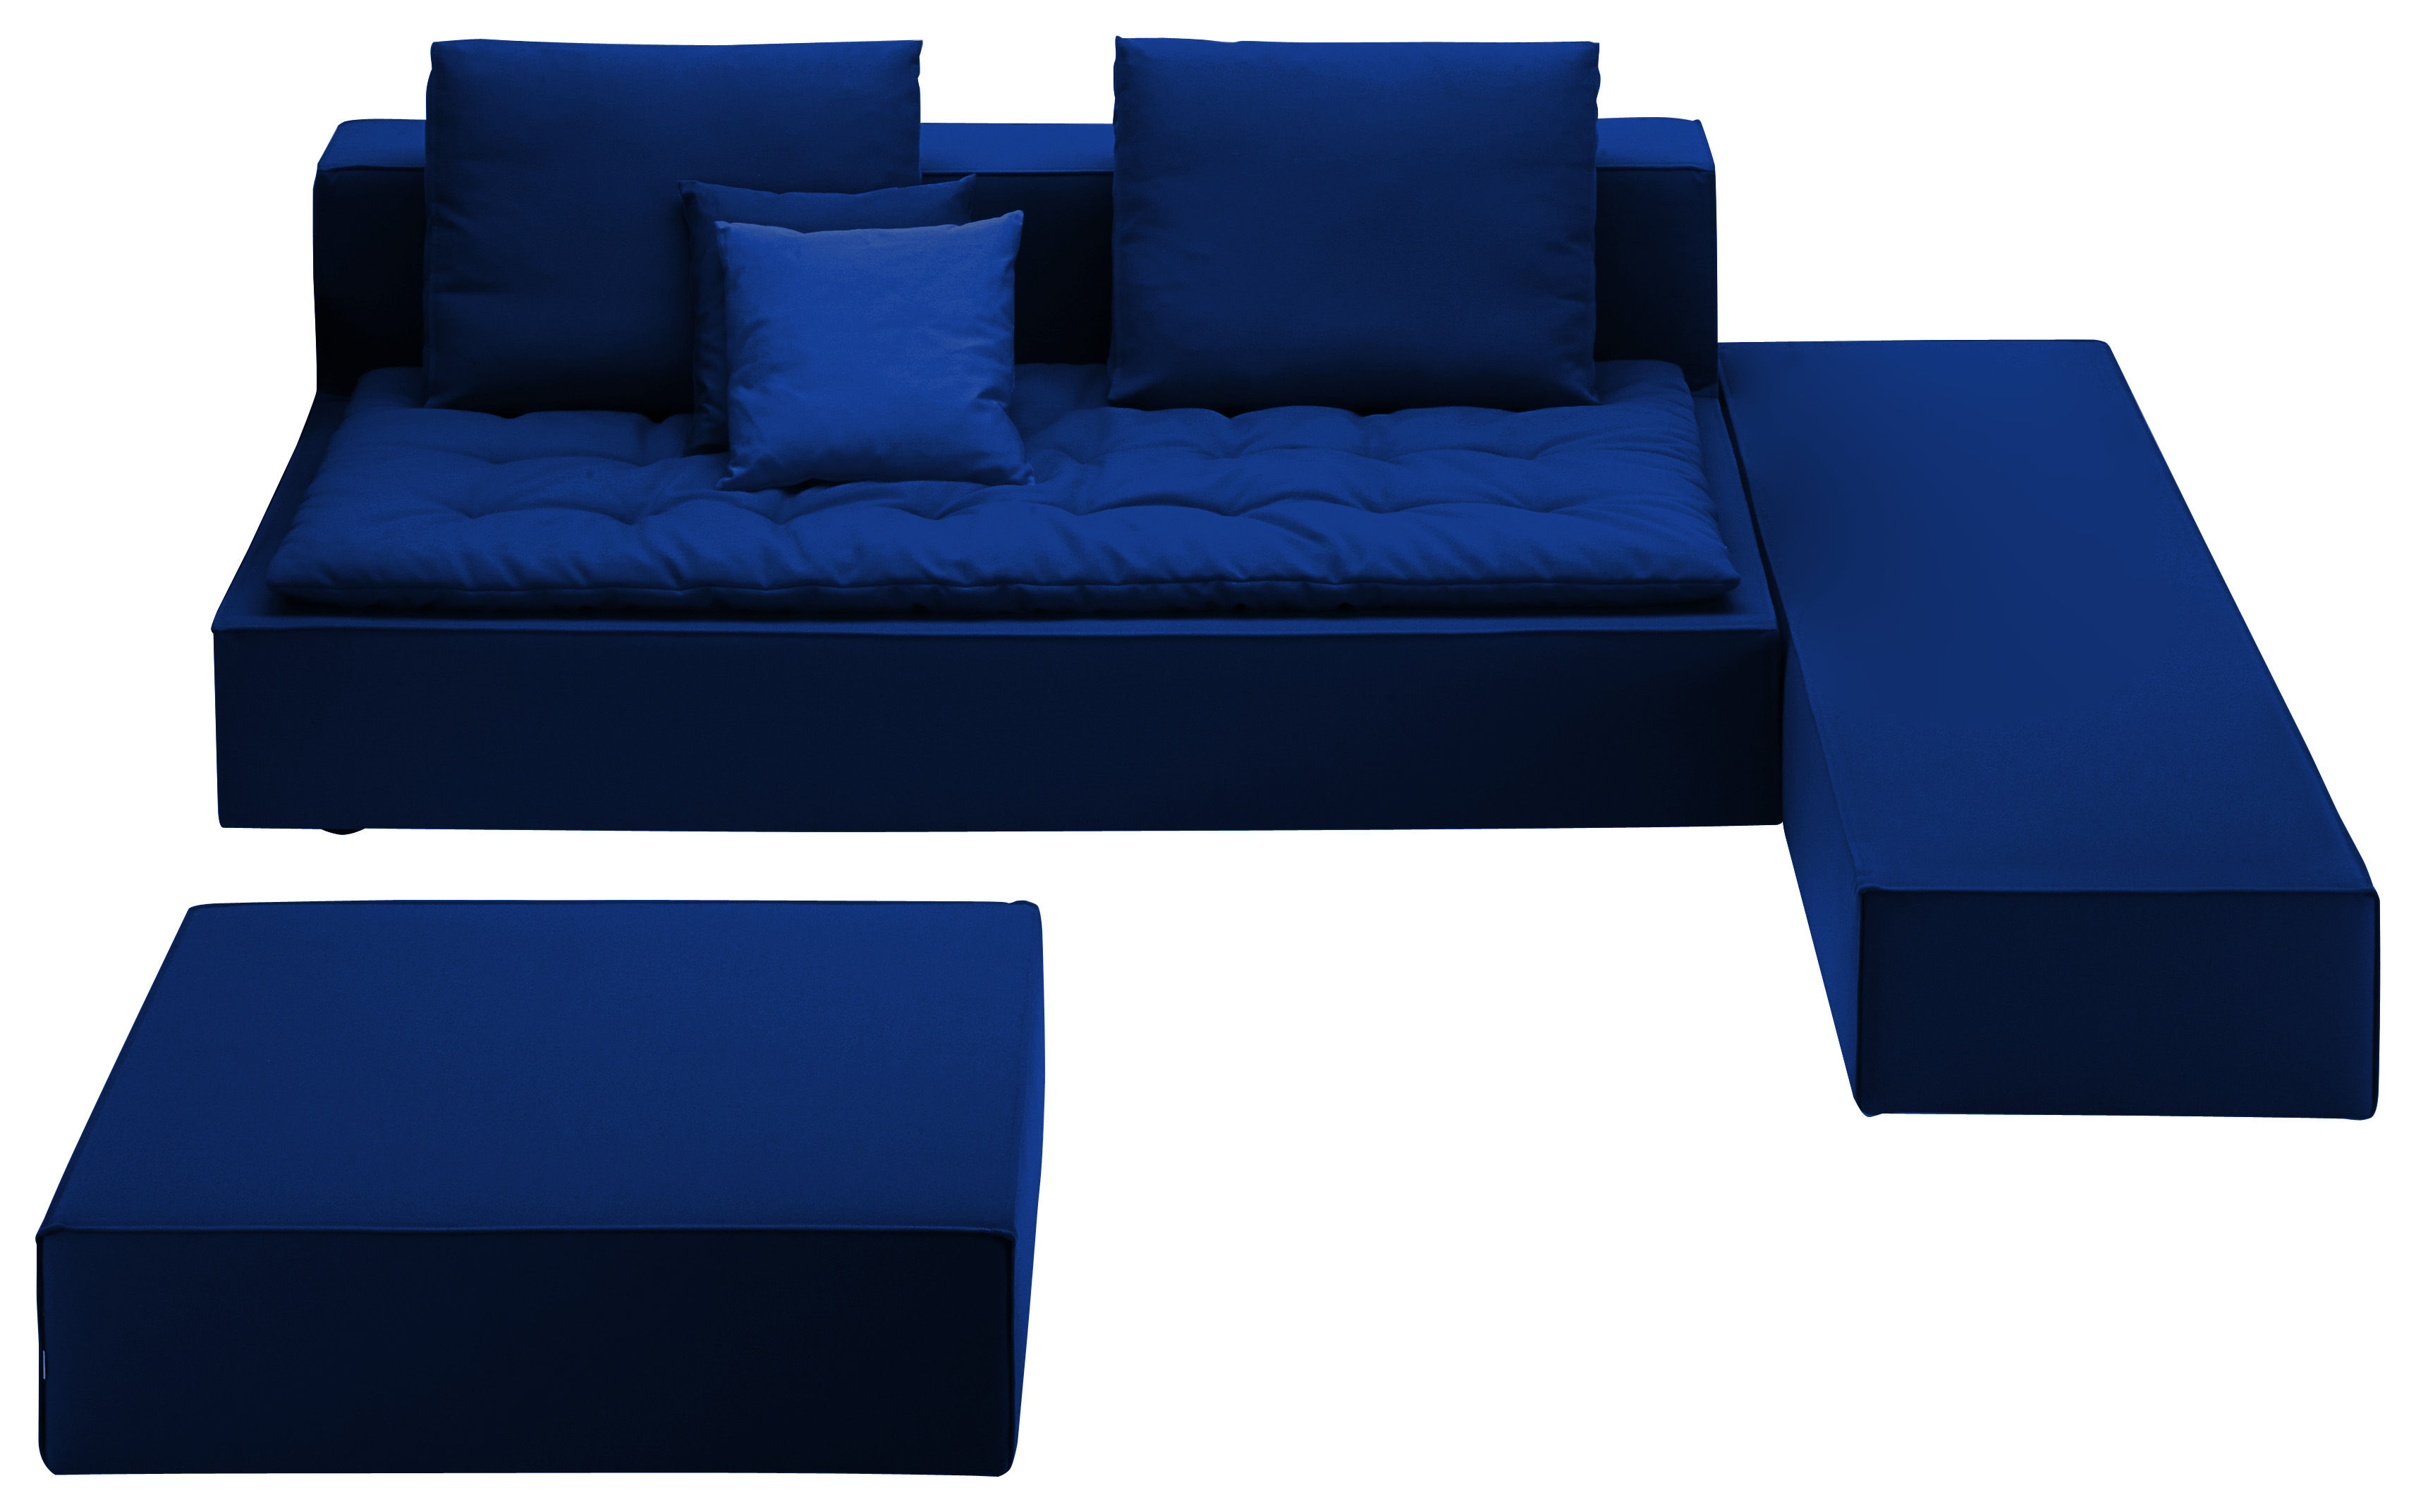 canap d 39 angle domino composition l 282 cm bleu fonc zanotta. Black Bedroom Furniture Sets. Home Design Ideas